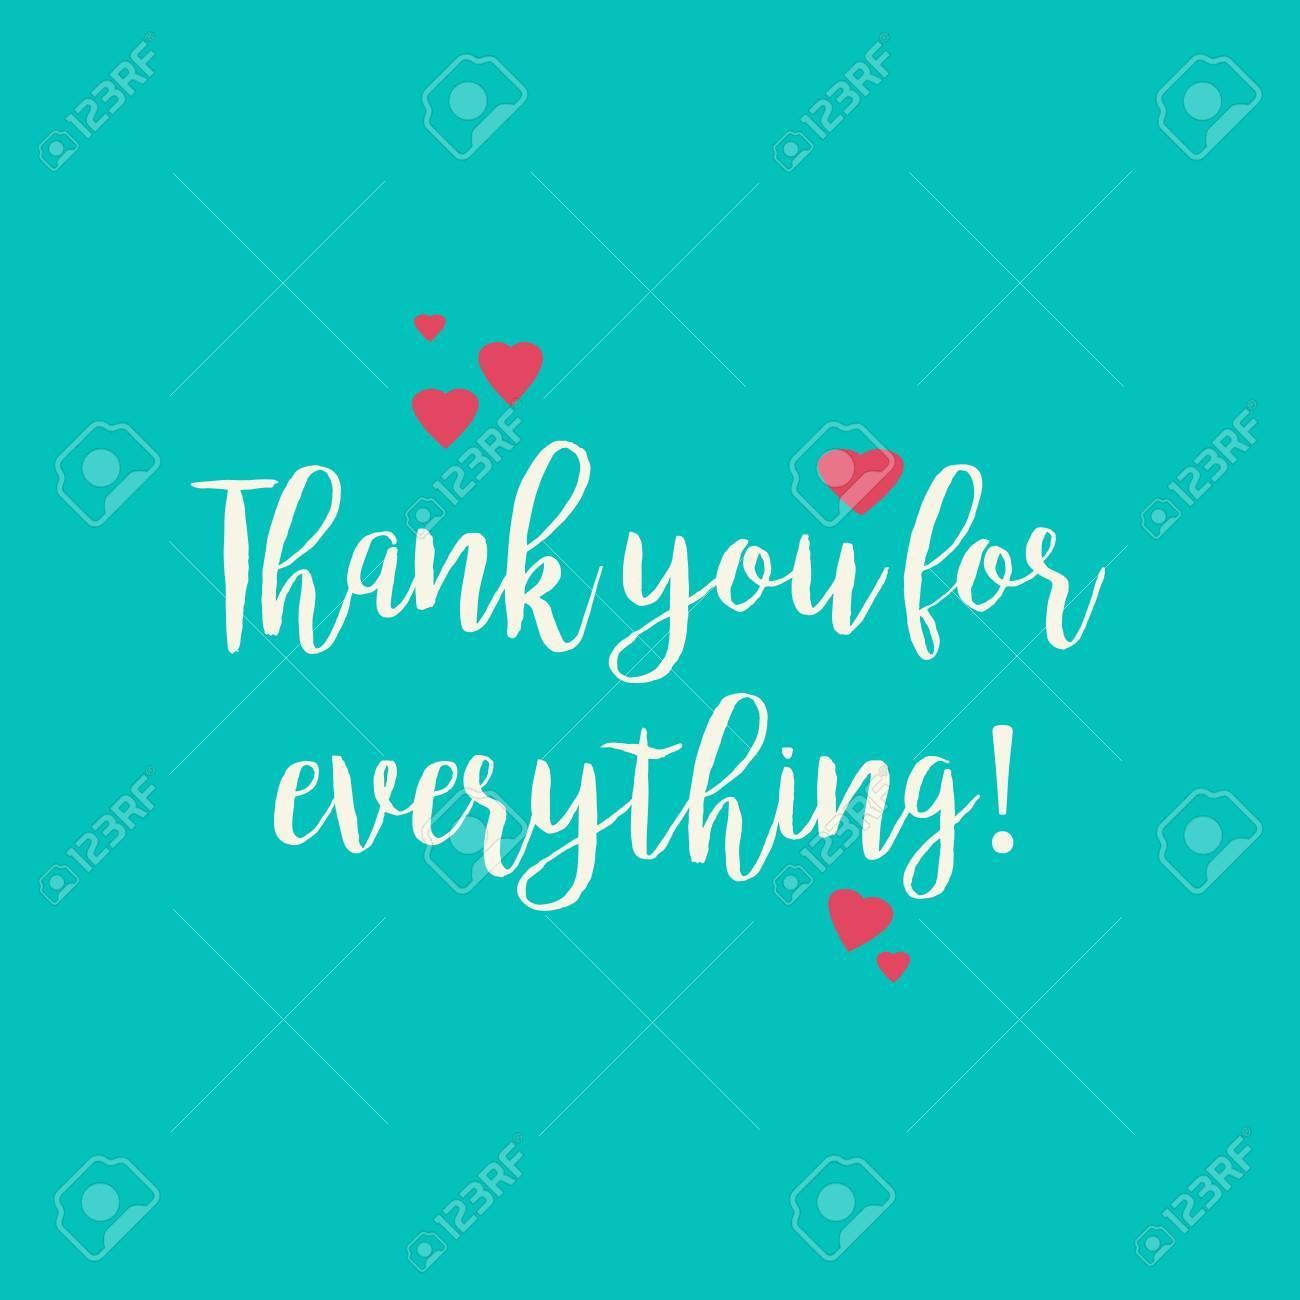 Trullo Azul Turquesa Gracias Por Todo La Tarjeta De Felicitación Con